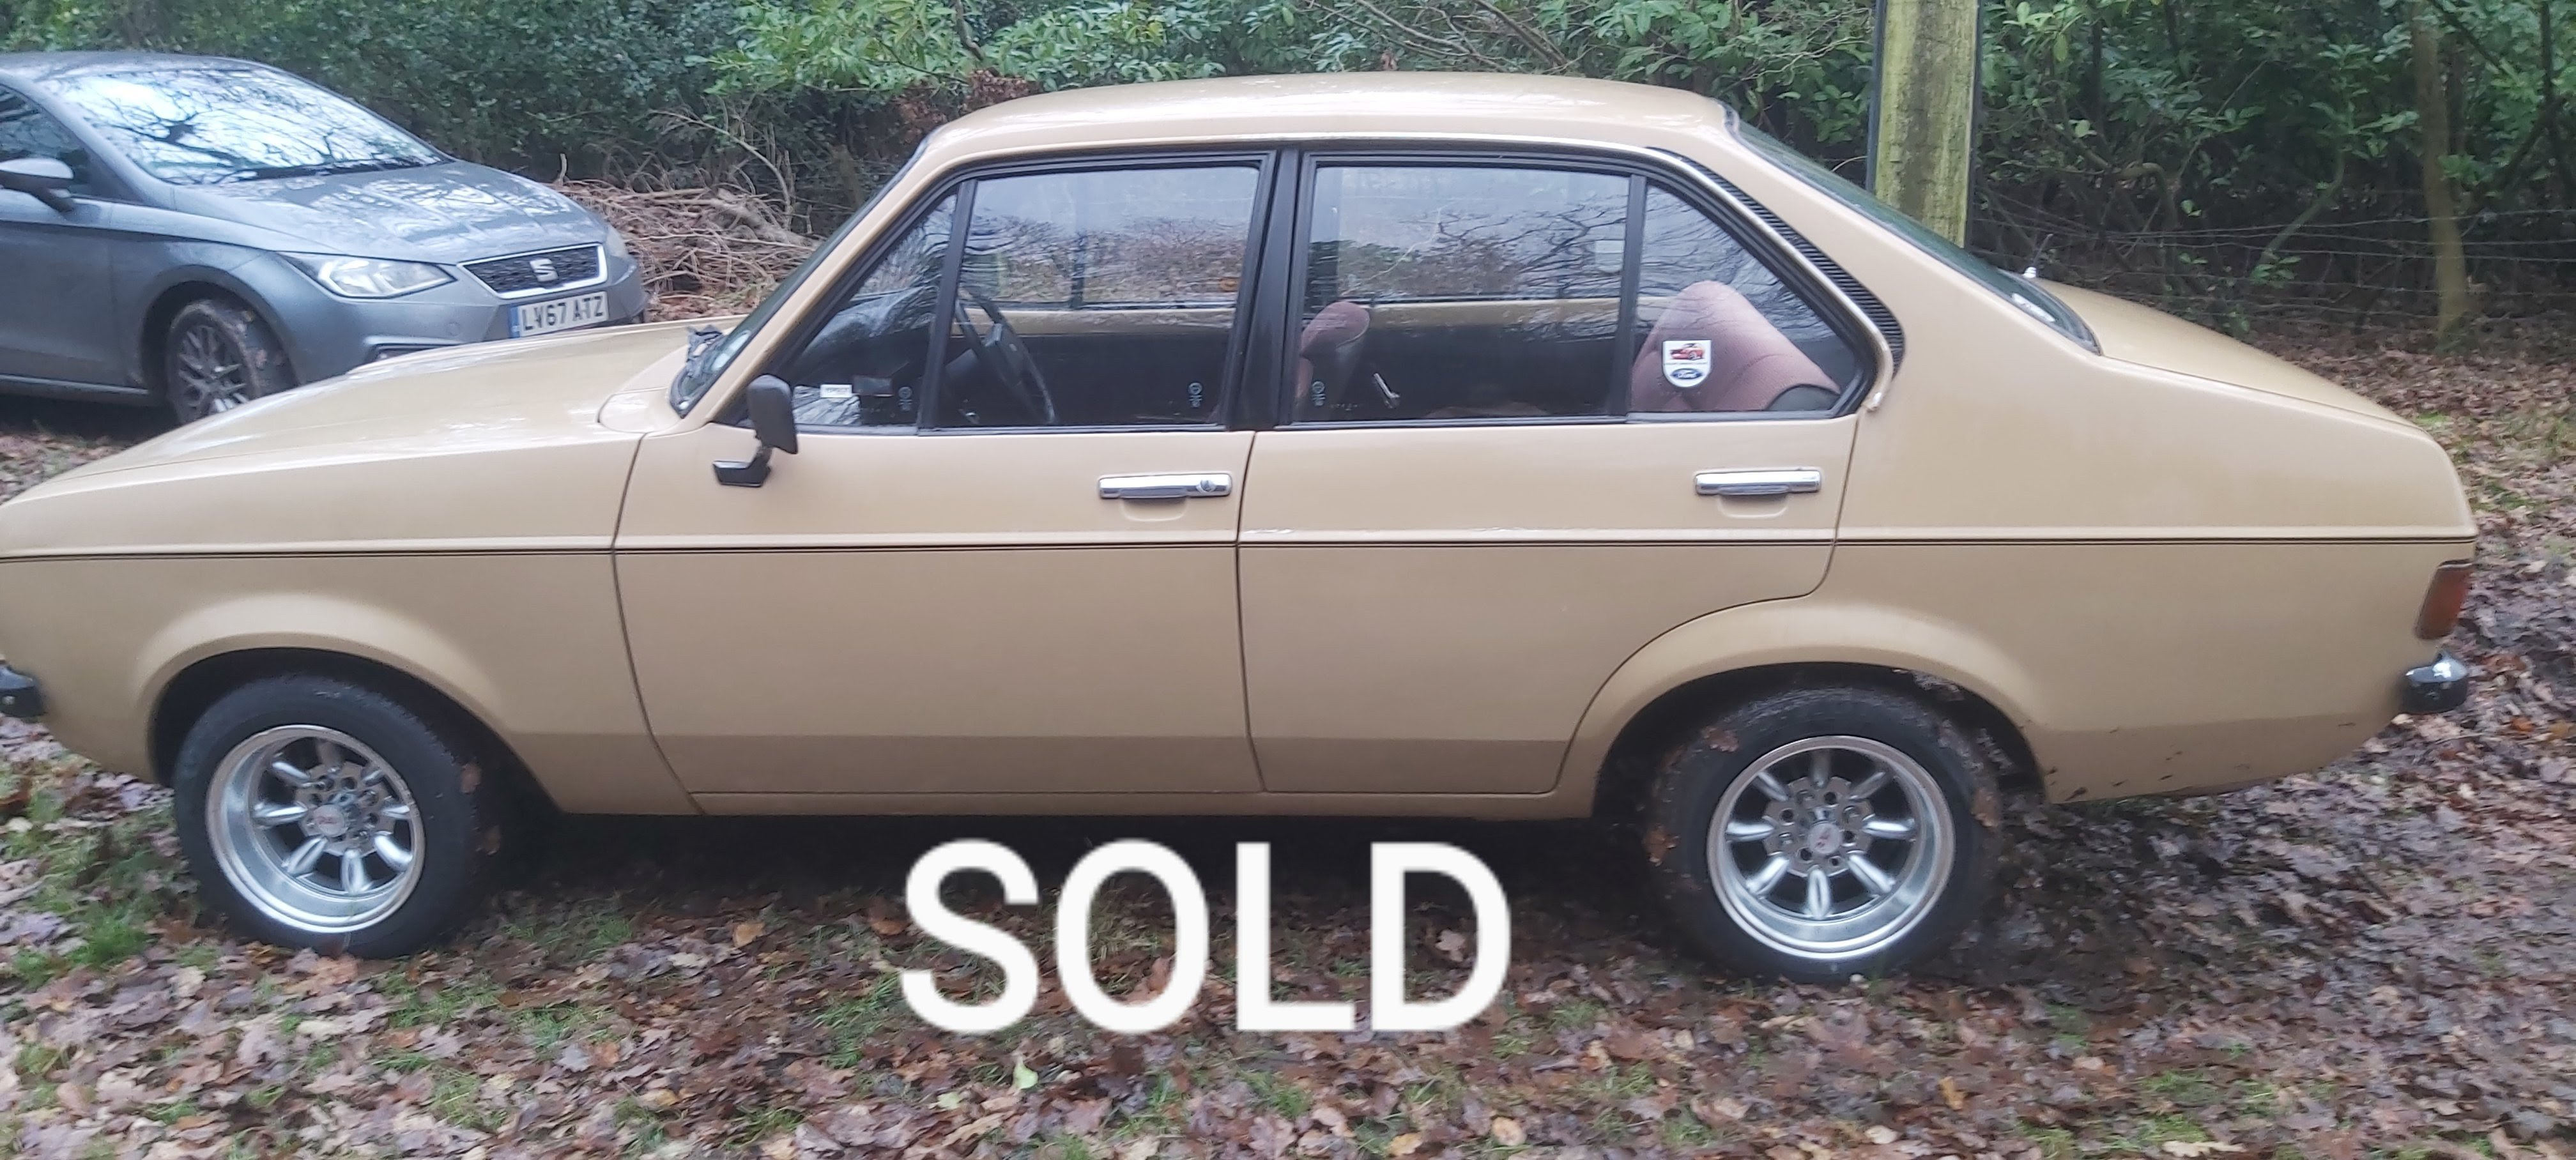 Ford escort 4dr 1.3..........SOLD